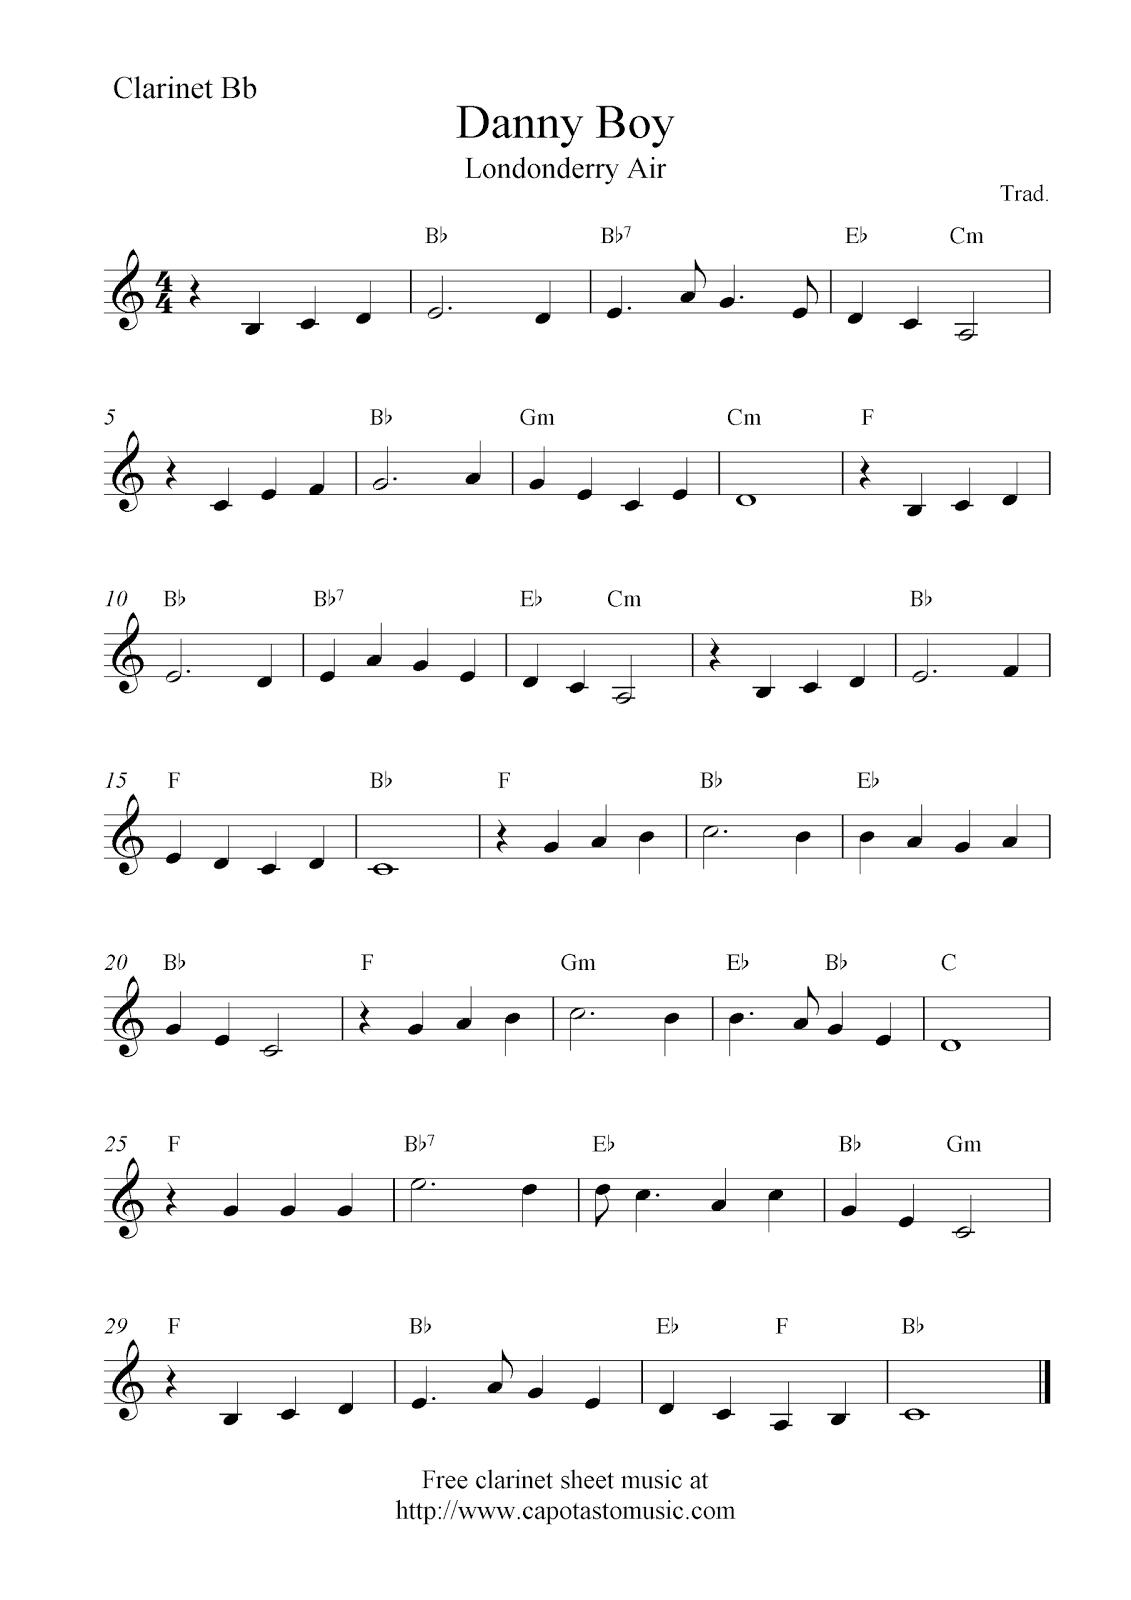 Danny Boy (Londonderry Air), Free Clarinet Sheet Music Notes - Free Printable Clarinet Music